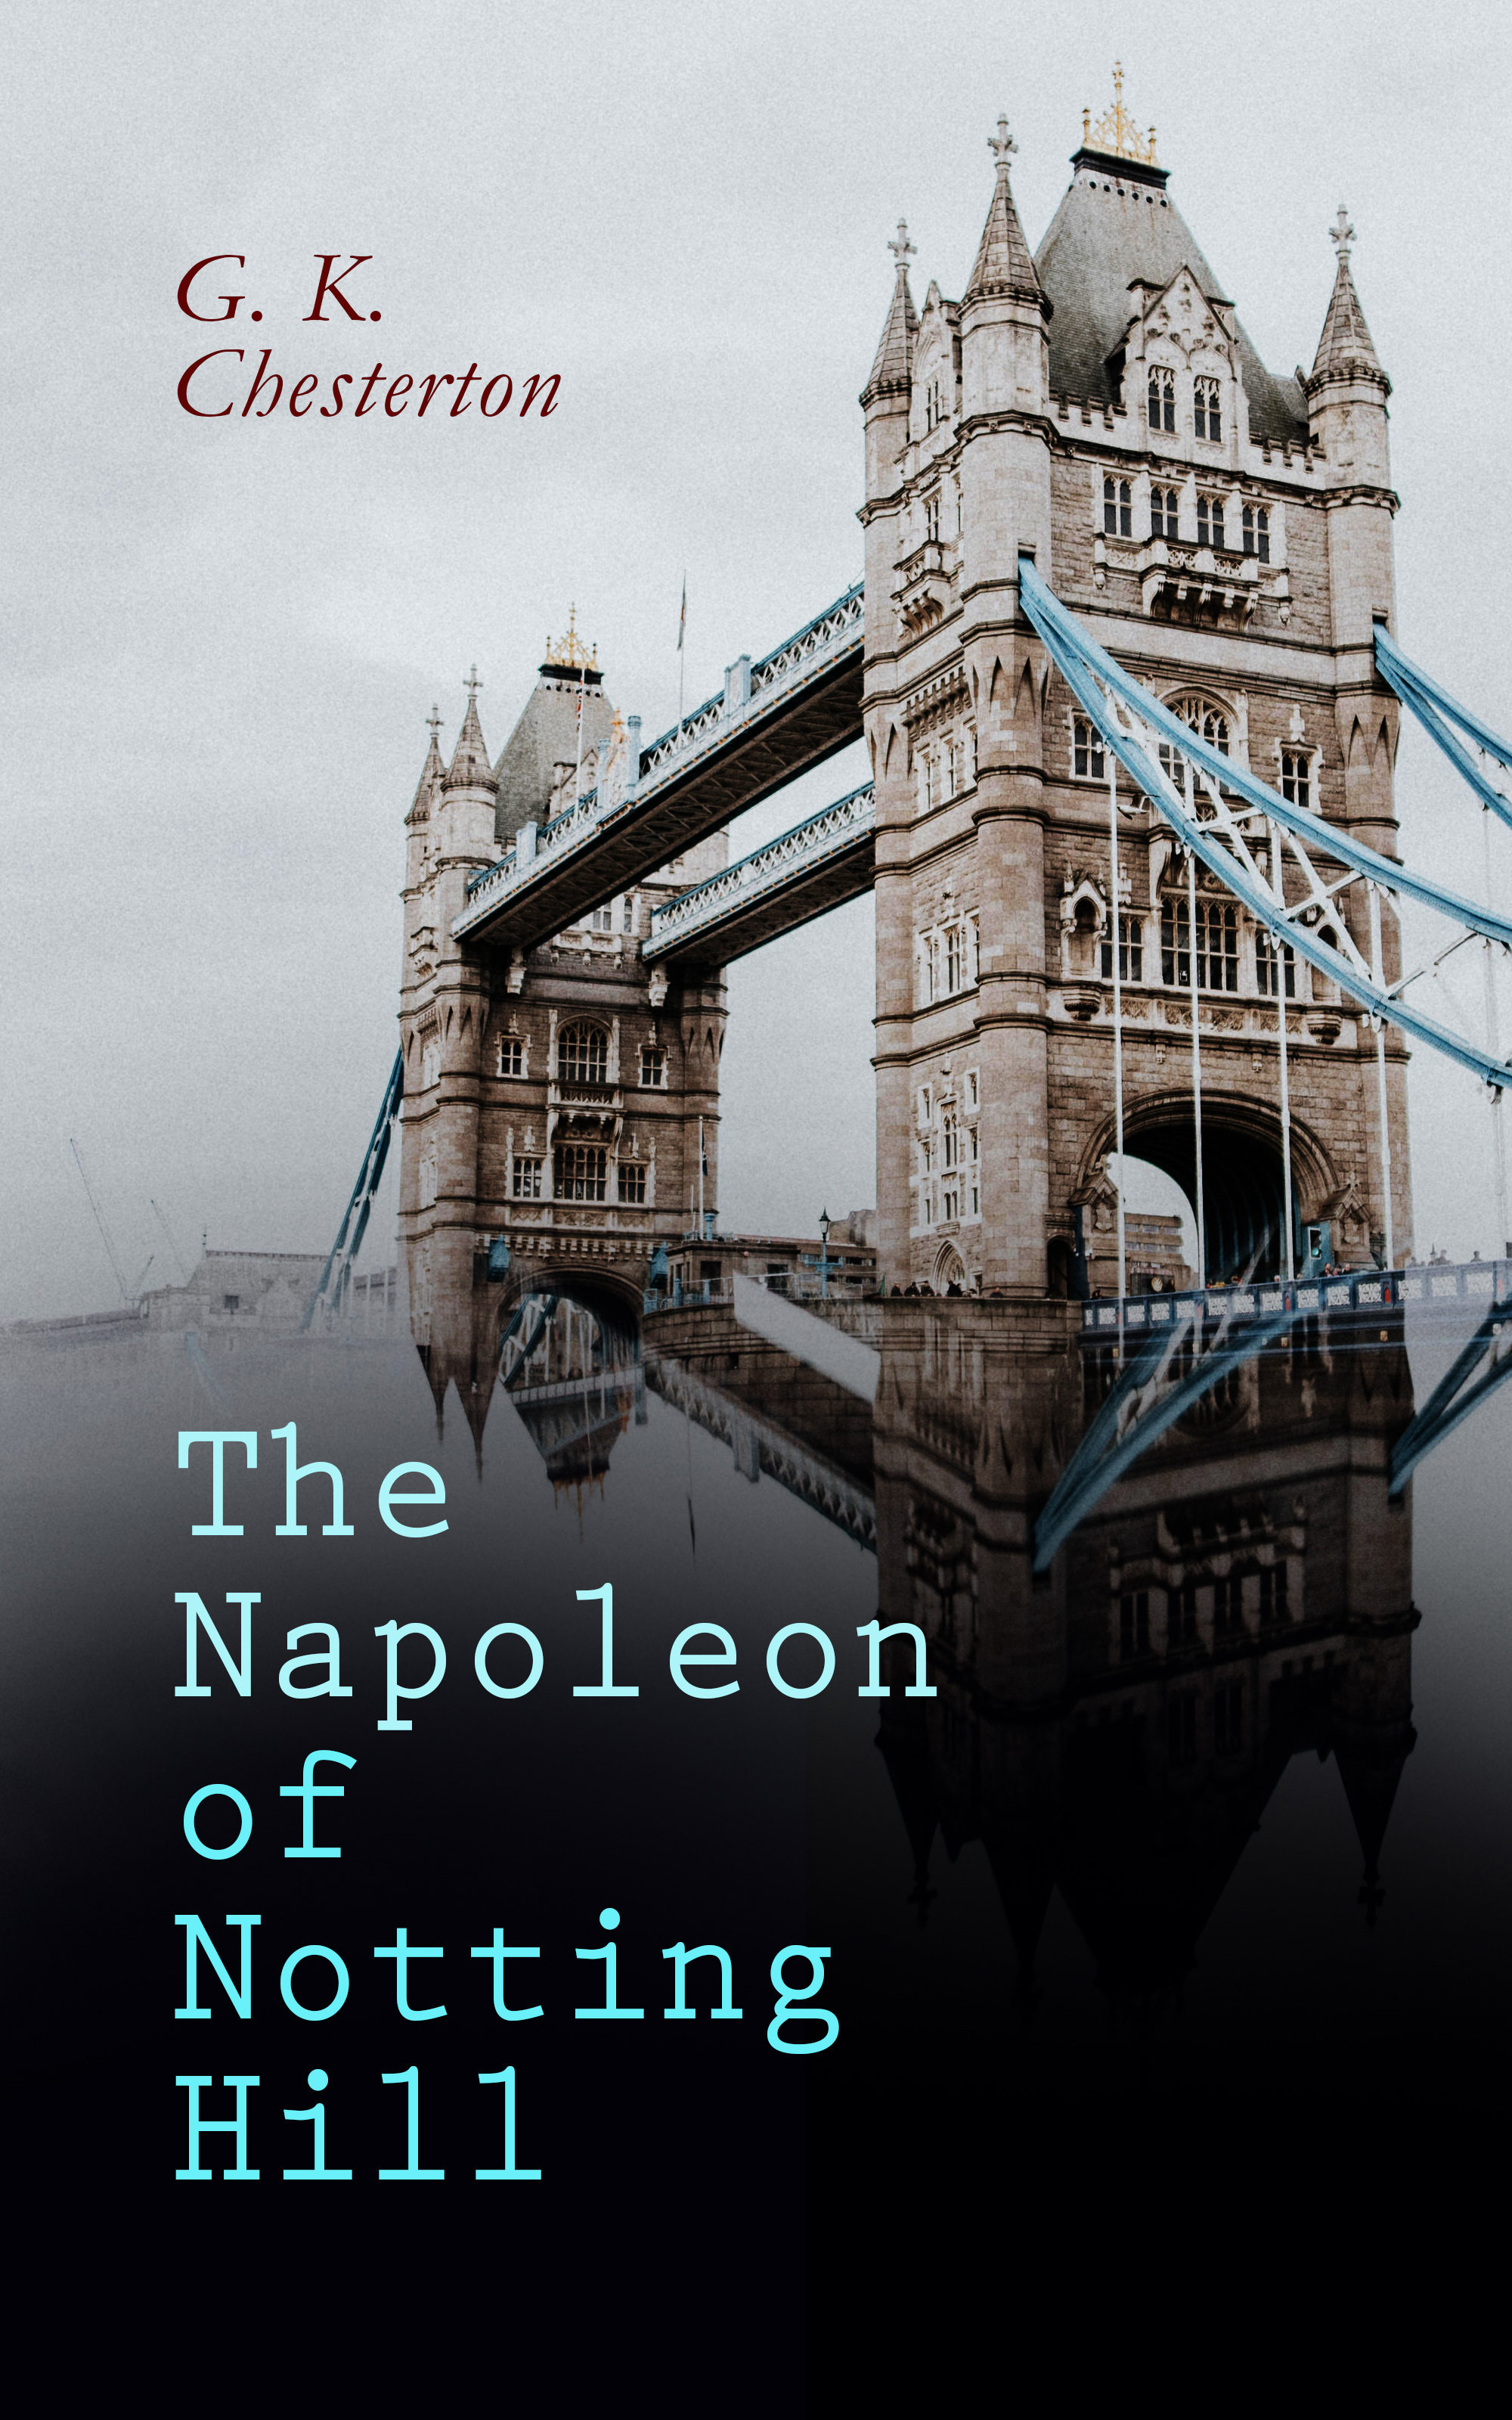 G. K. Chesterton The Napoleon of Notting Hill g k chesterton the napoleon of notting hill